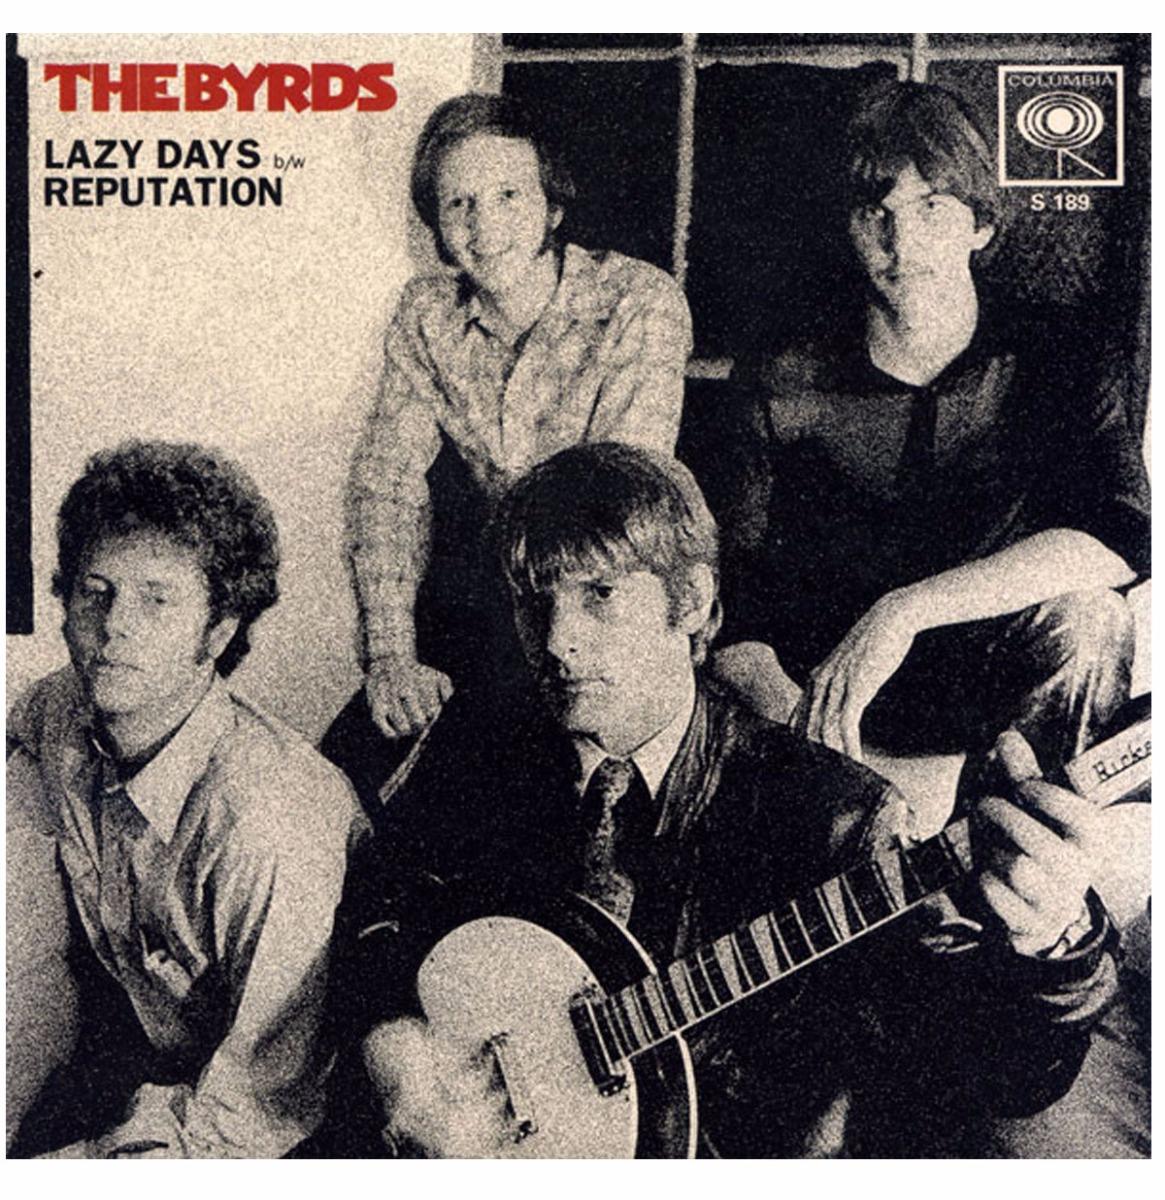 Single: Byrds, The - Lazy Days